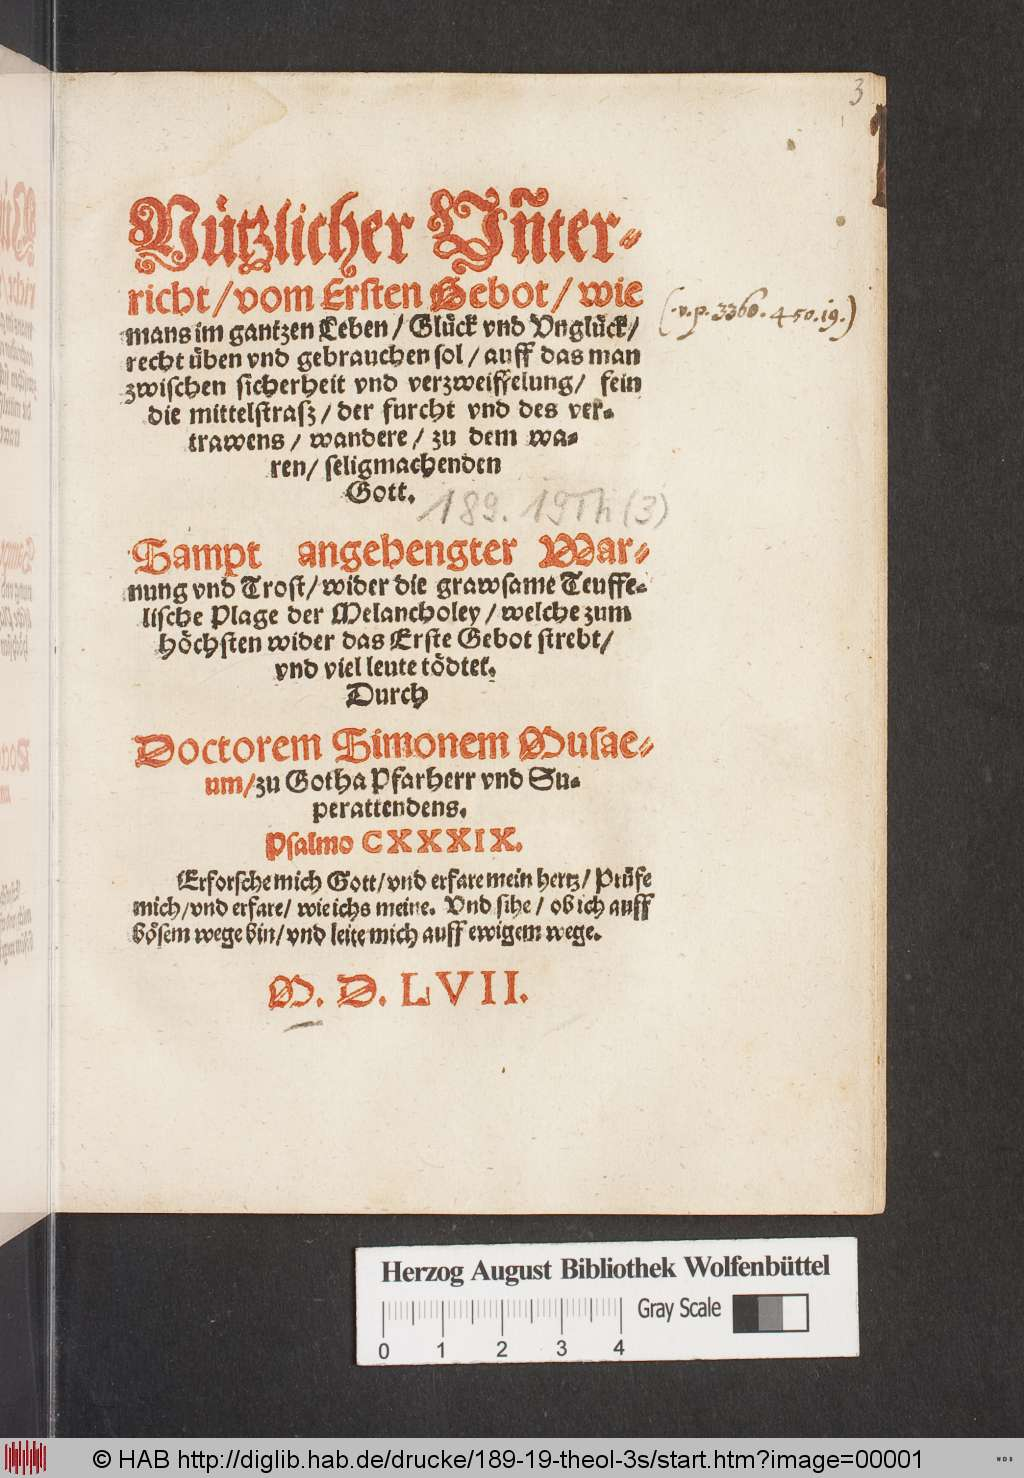 http://diglib.hab.de/drucke/189-19-theol-3s/00001.jpg